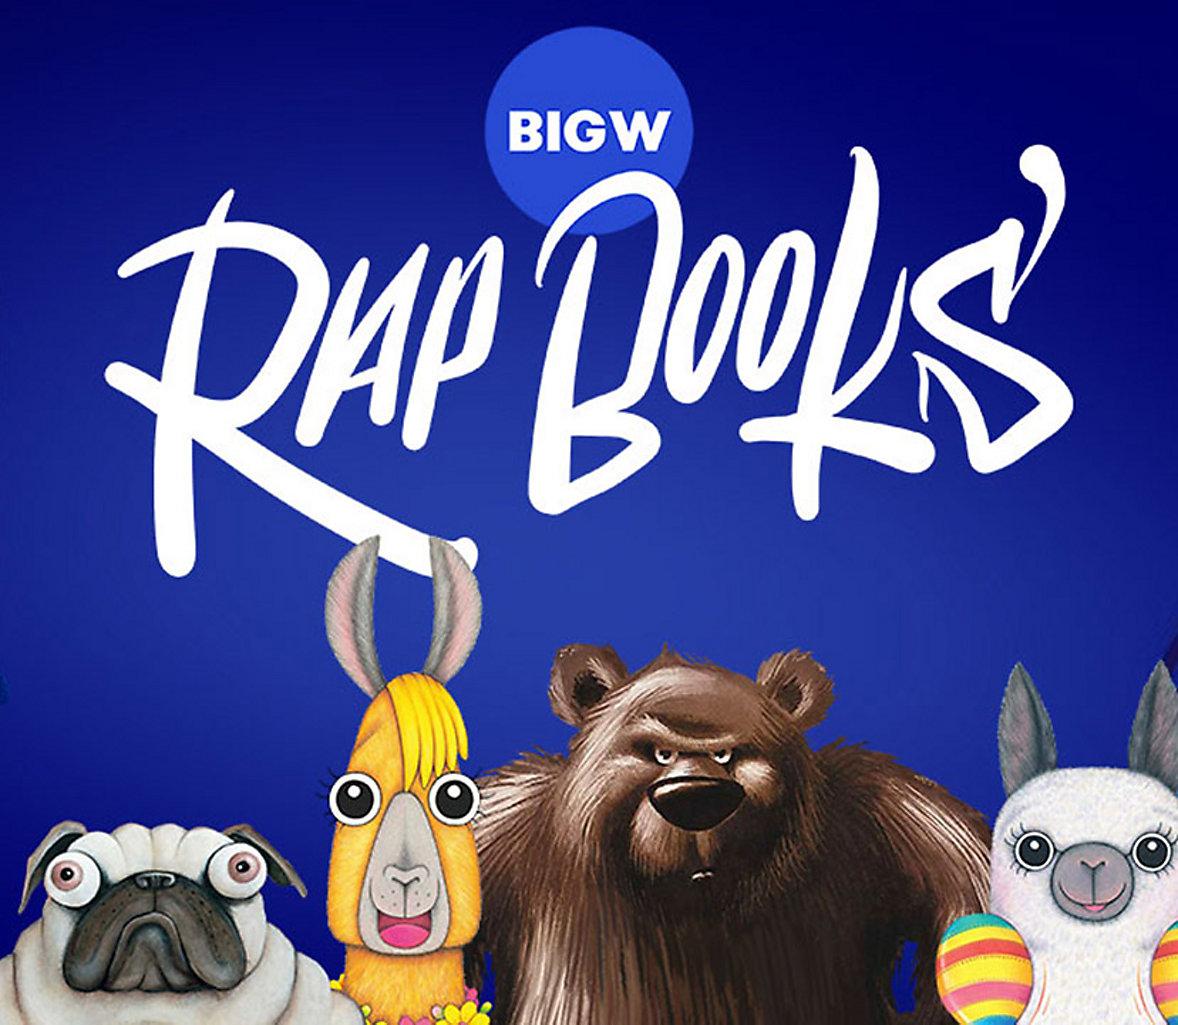 Big Days at Home Rapbooks